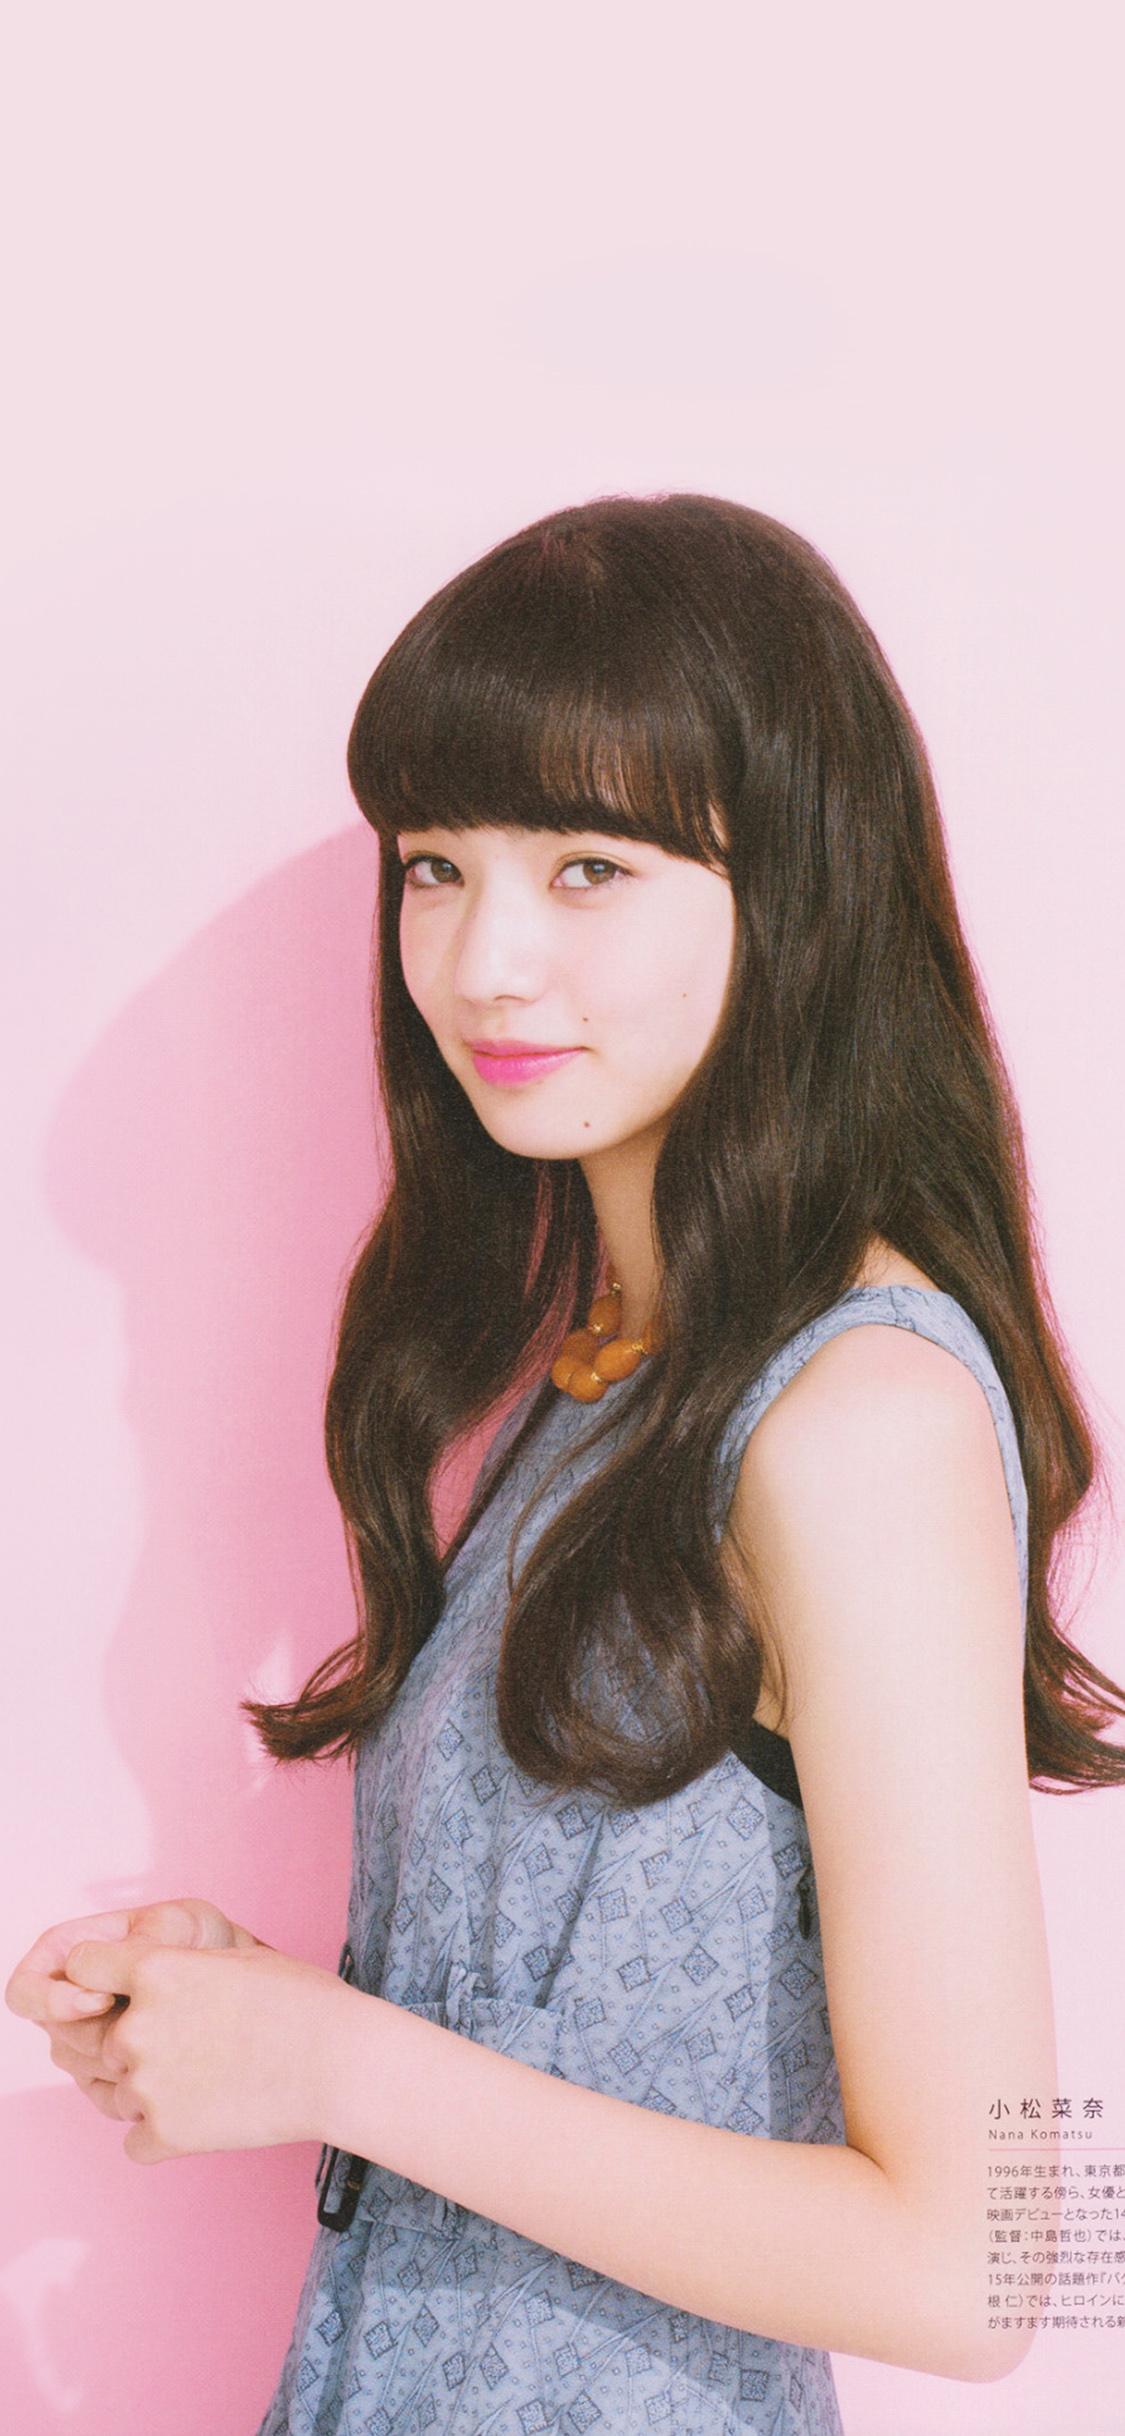 Simple Iphone X Wallpaper Hn41 Nana Komatsu Cute Film Asian Girl Wallpaper